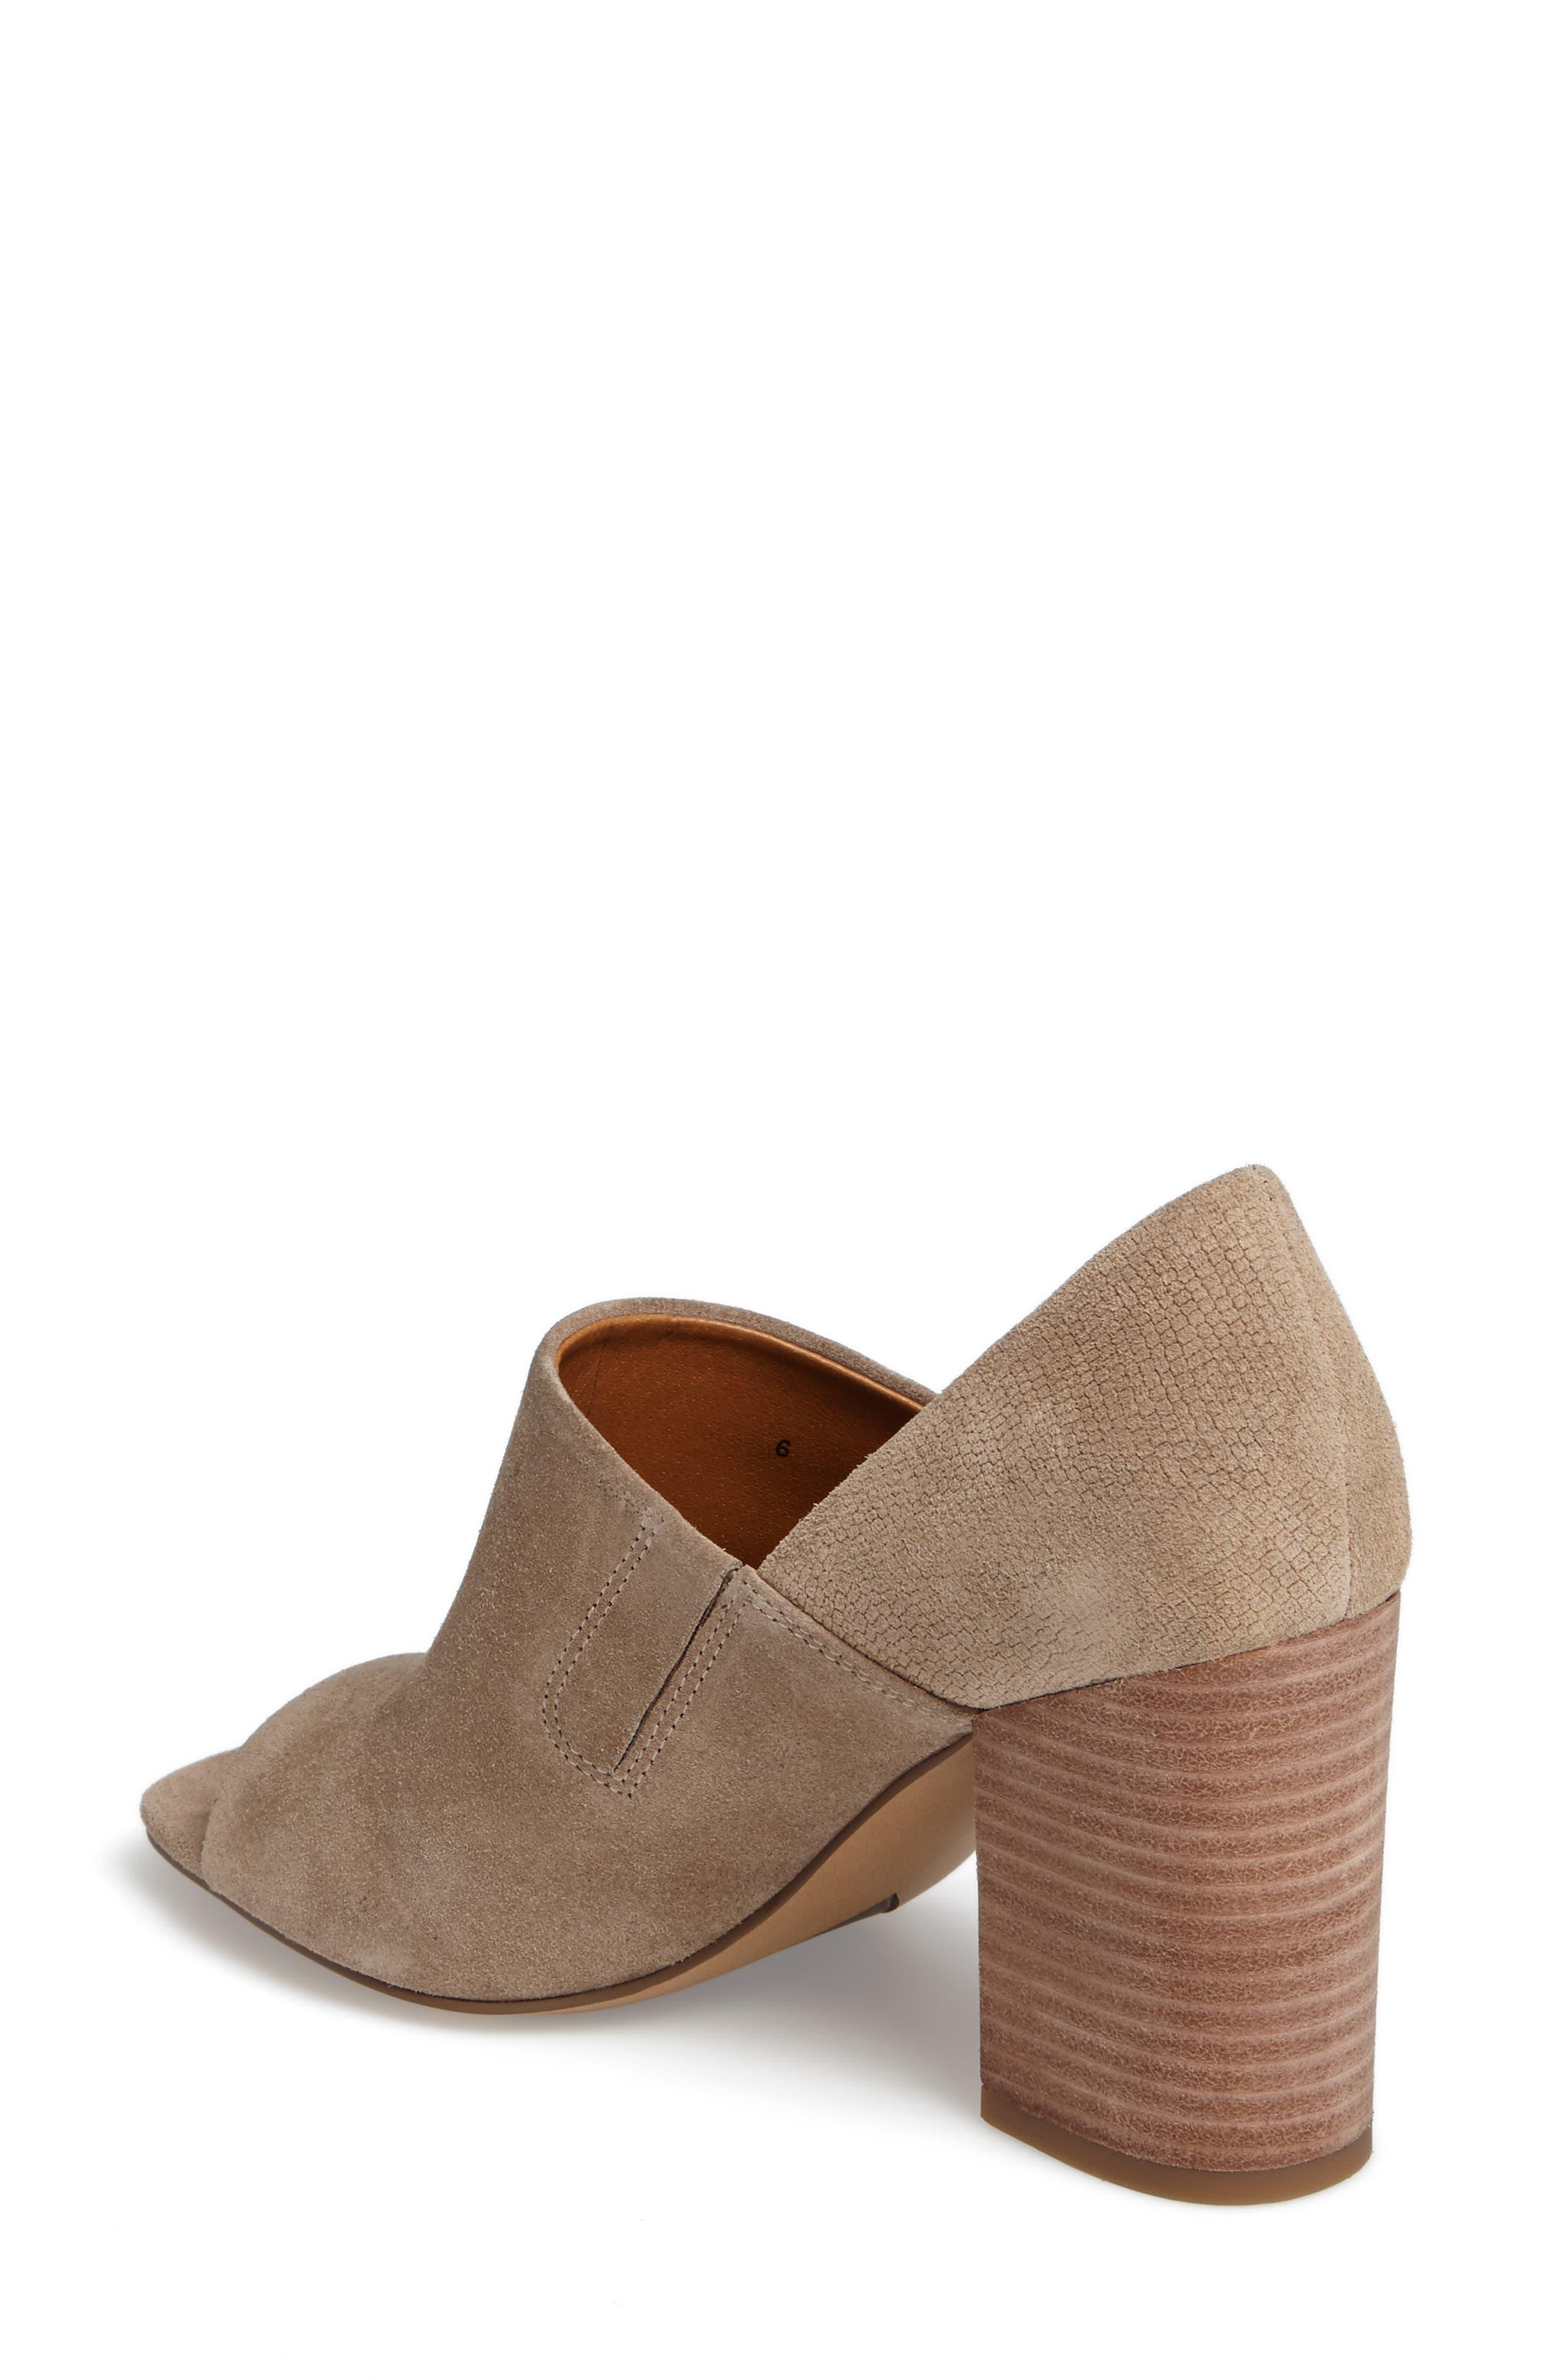 Ellison Block Heel Sandal,                             Alternate thumbnail 6, color,